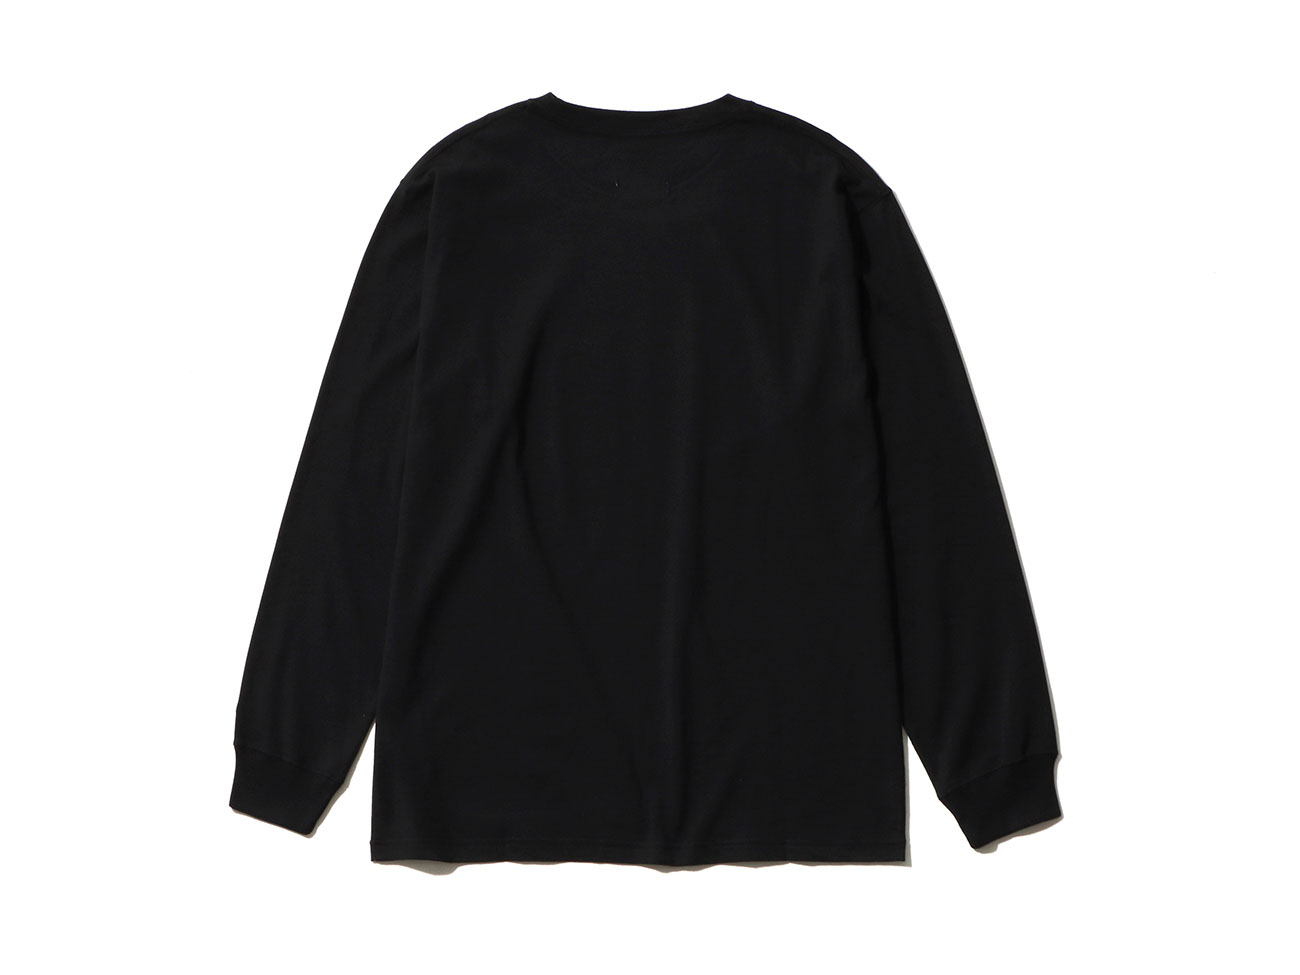 Yohji Yamamoto × New Era MINI LOGO L/S COTTON TEE